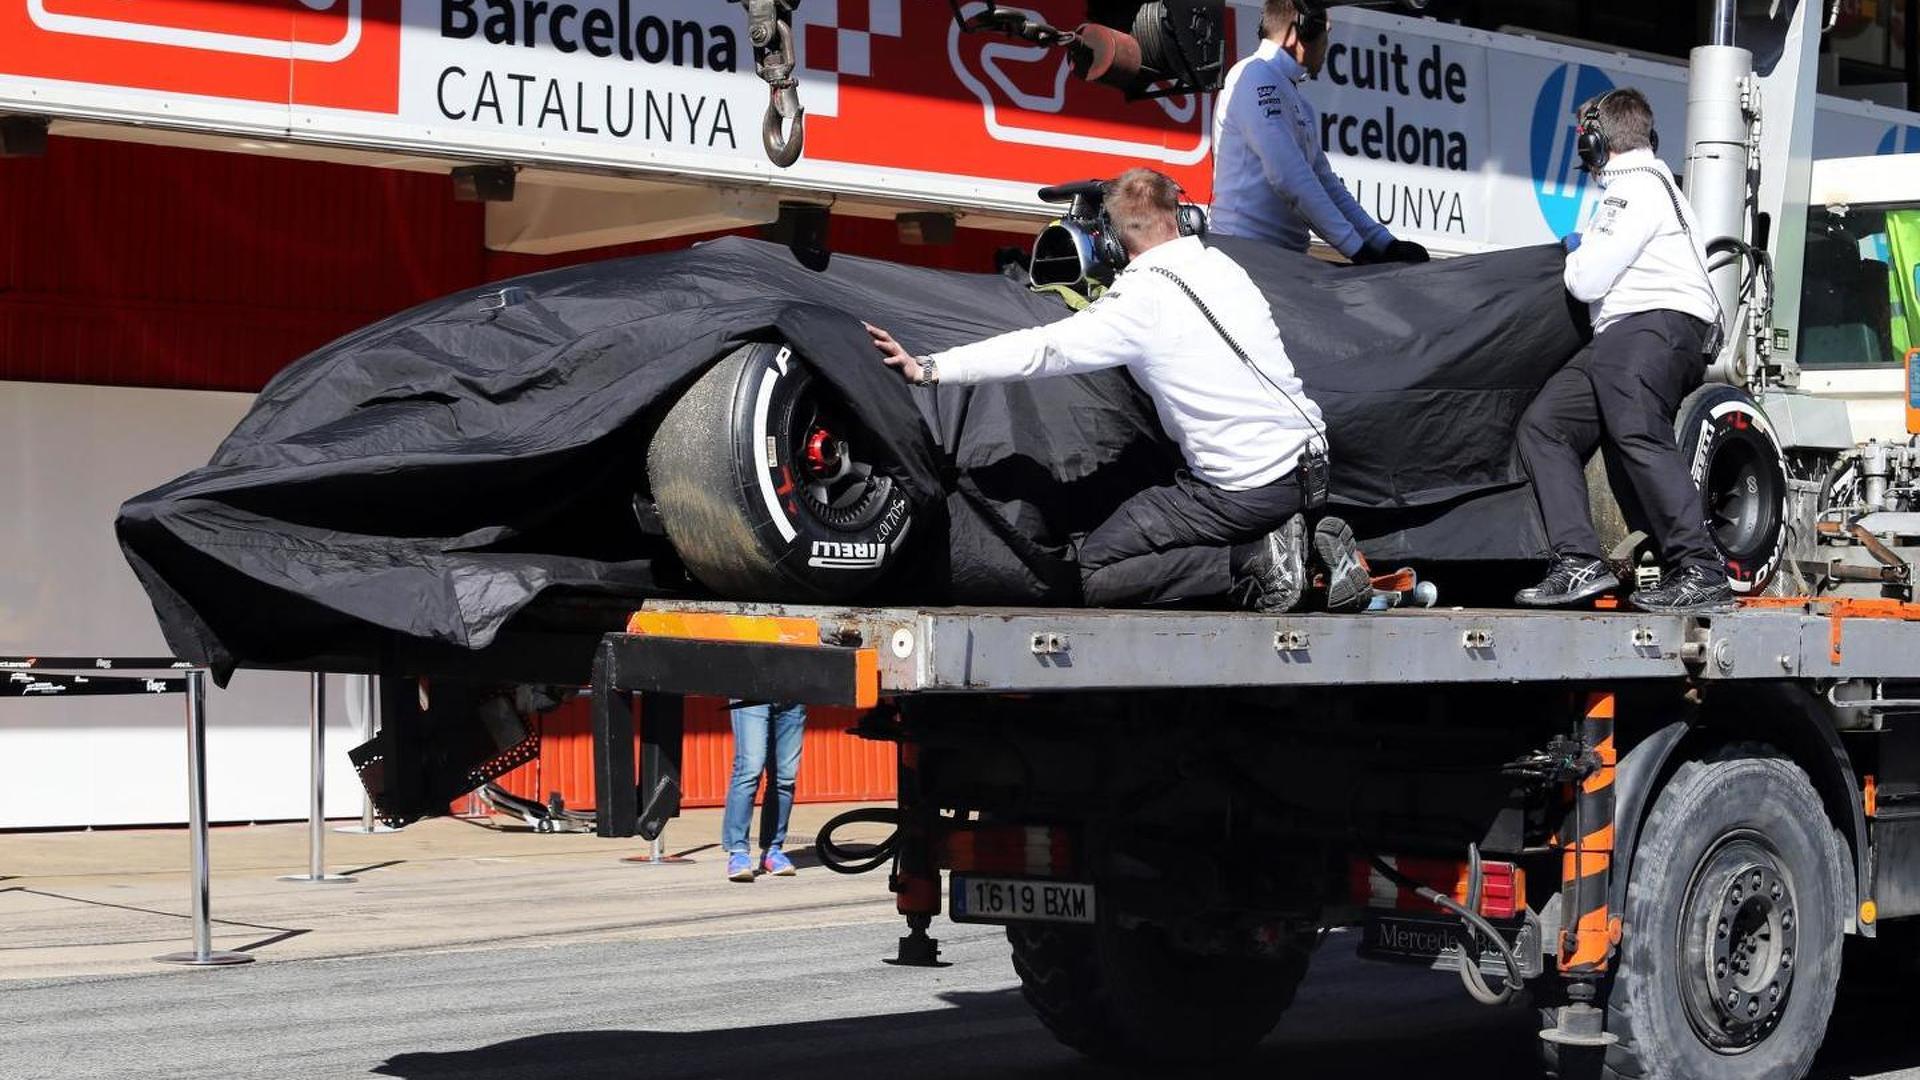 Villeneuve admits Alonso crash saga 'weird'